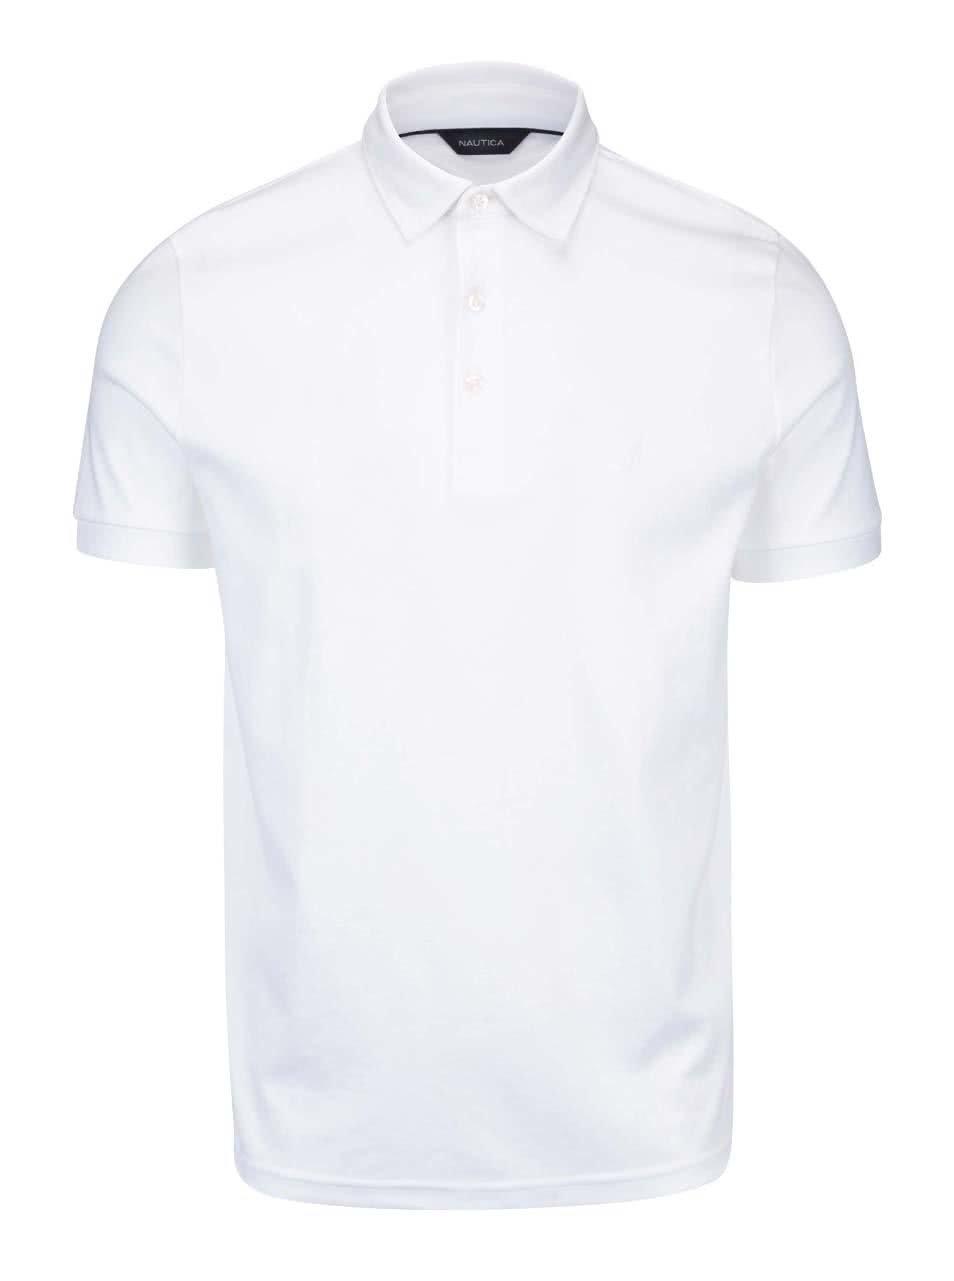 Bílé pánské polo triko Nautica ... 9da1d4f402